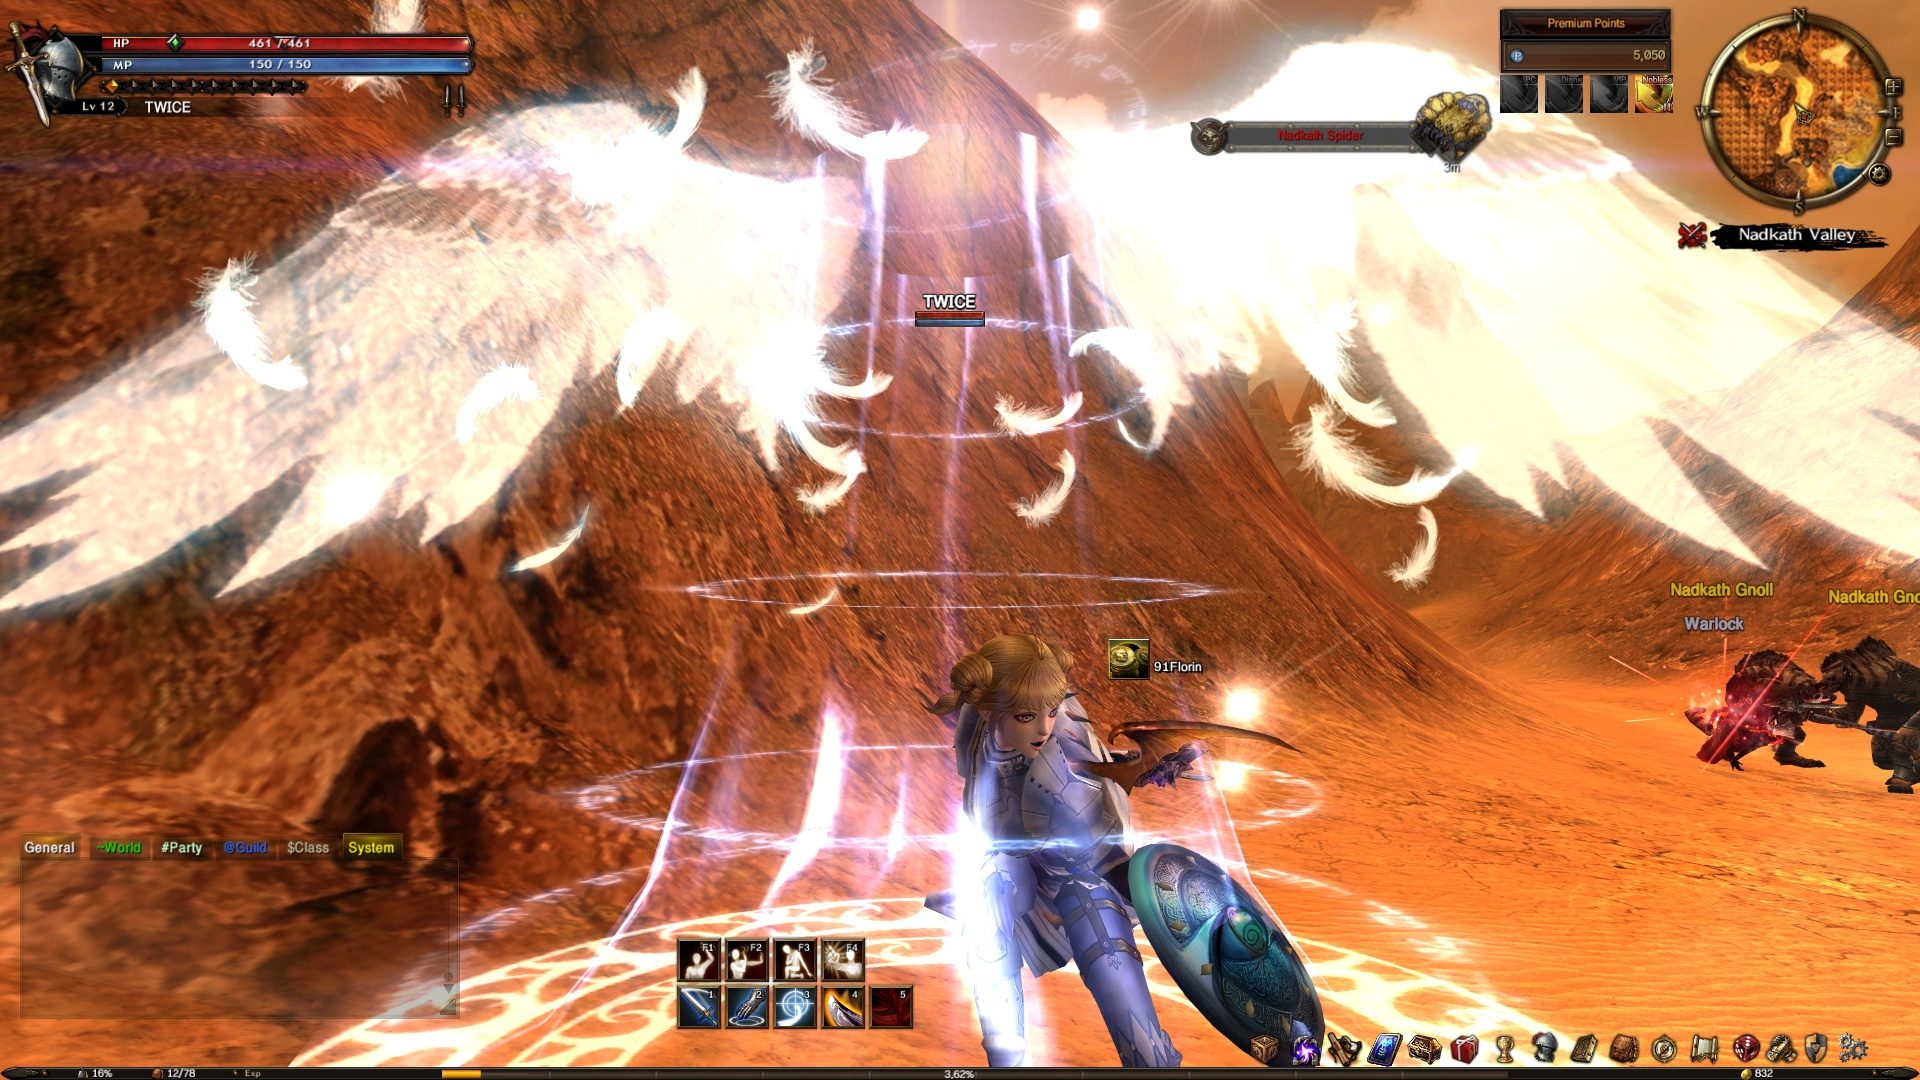 images?q=tbn:ANd9GcQh_l3eQ5xwiPy07kGEXjmjgmBKBRB7H2mRxCGhv1tFWg5c_mWT Ideas For Internet Games Rpg @koolgadgetz.com.info